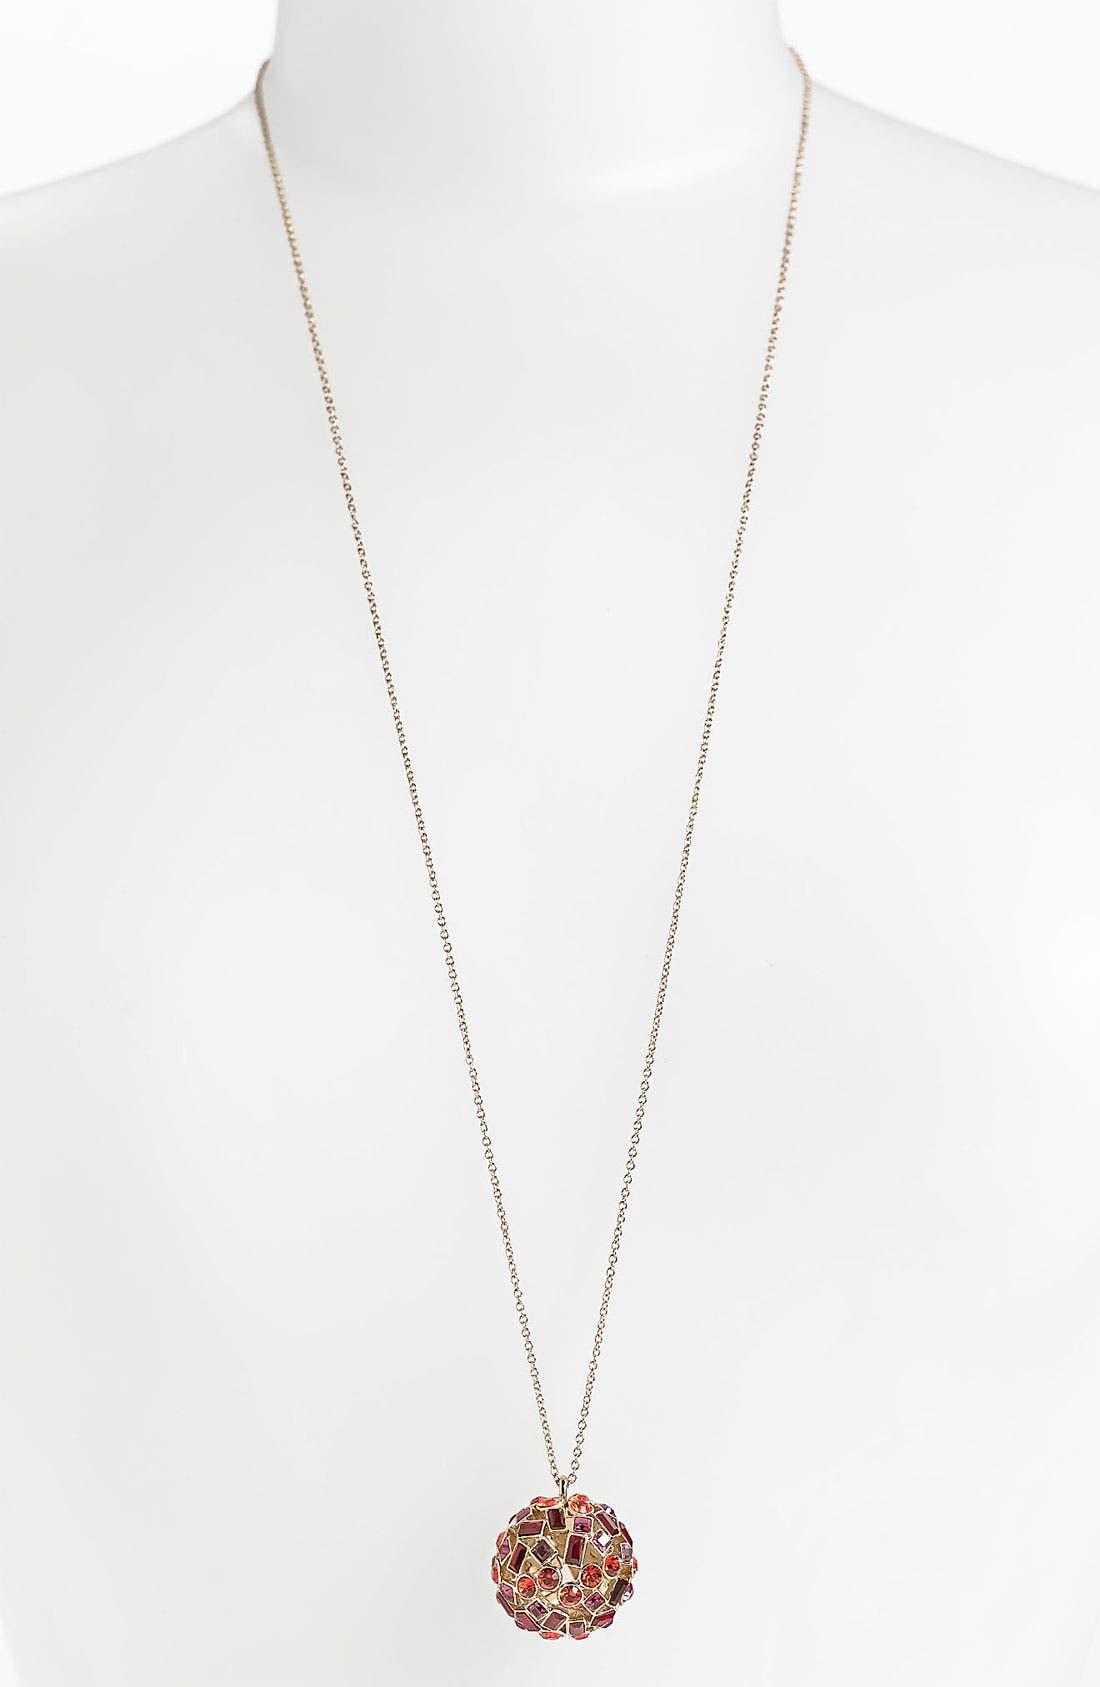 Main Image - kate spade new york 'kaleidoball' pendant necklace